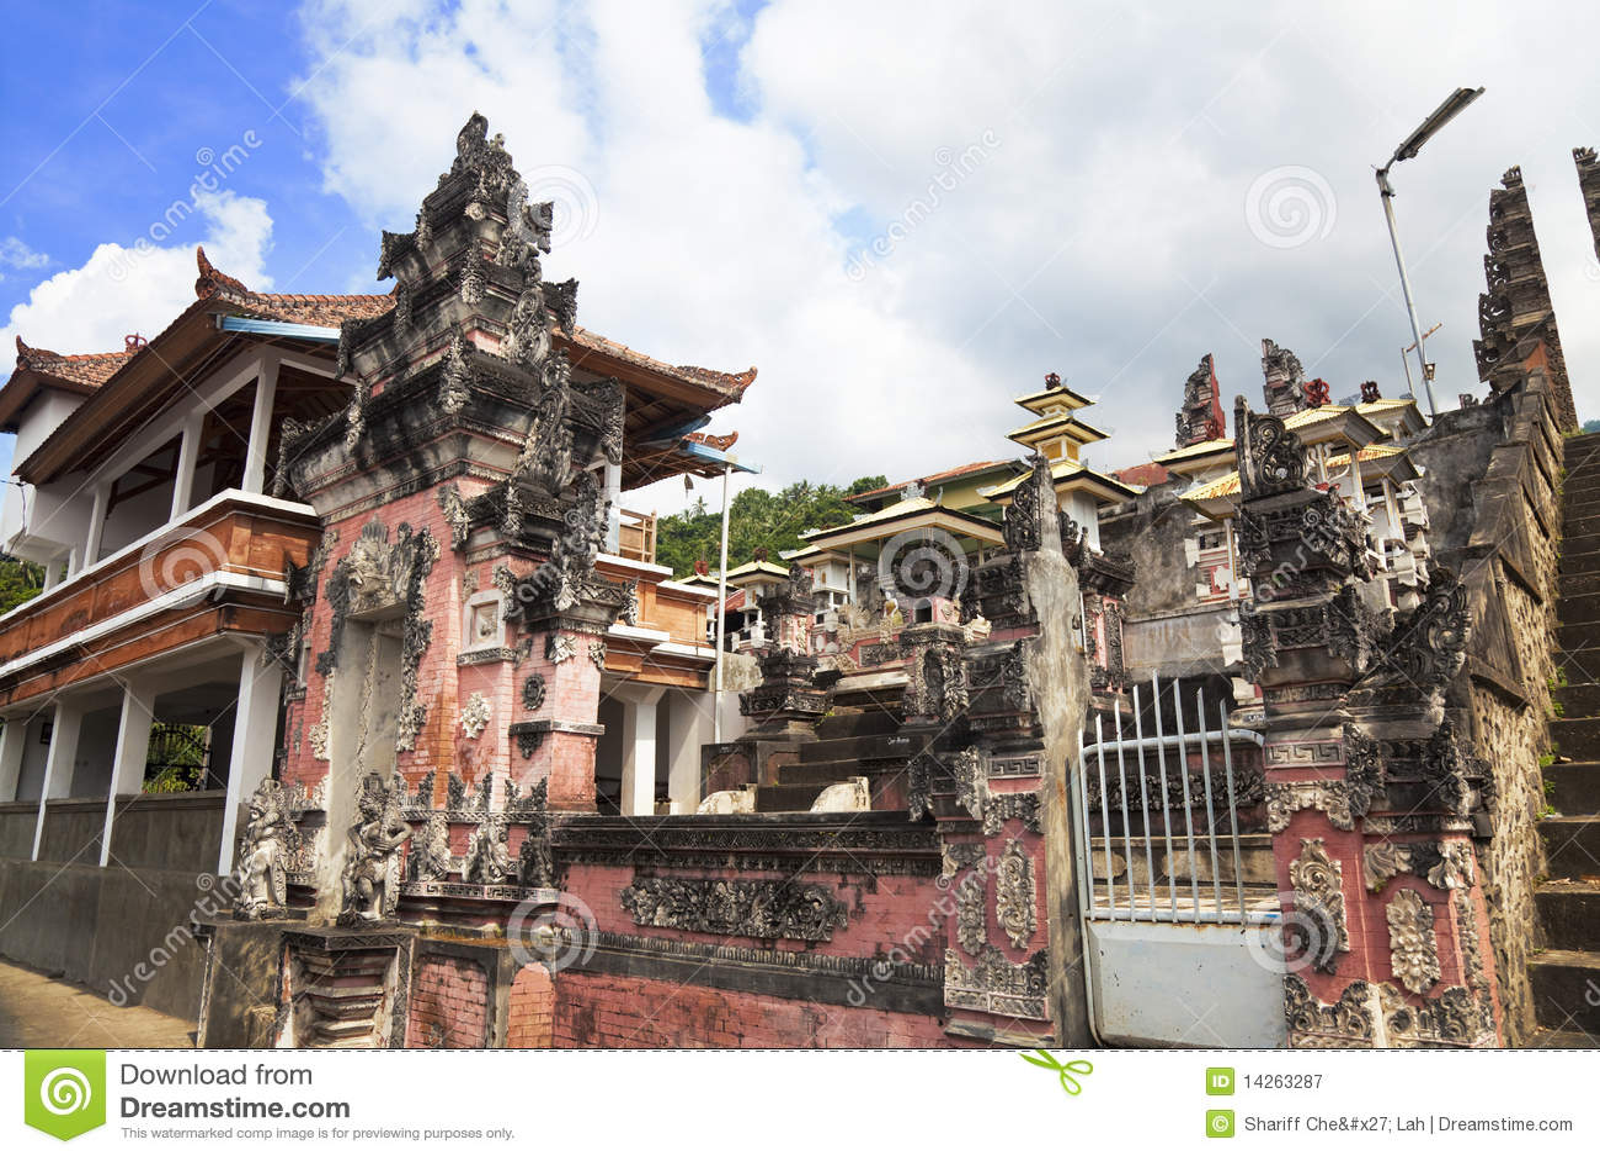 Agung pasar pura του Μπαλί Ινδονησία